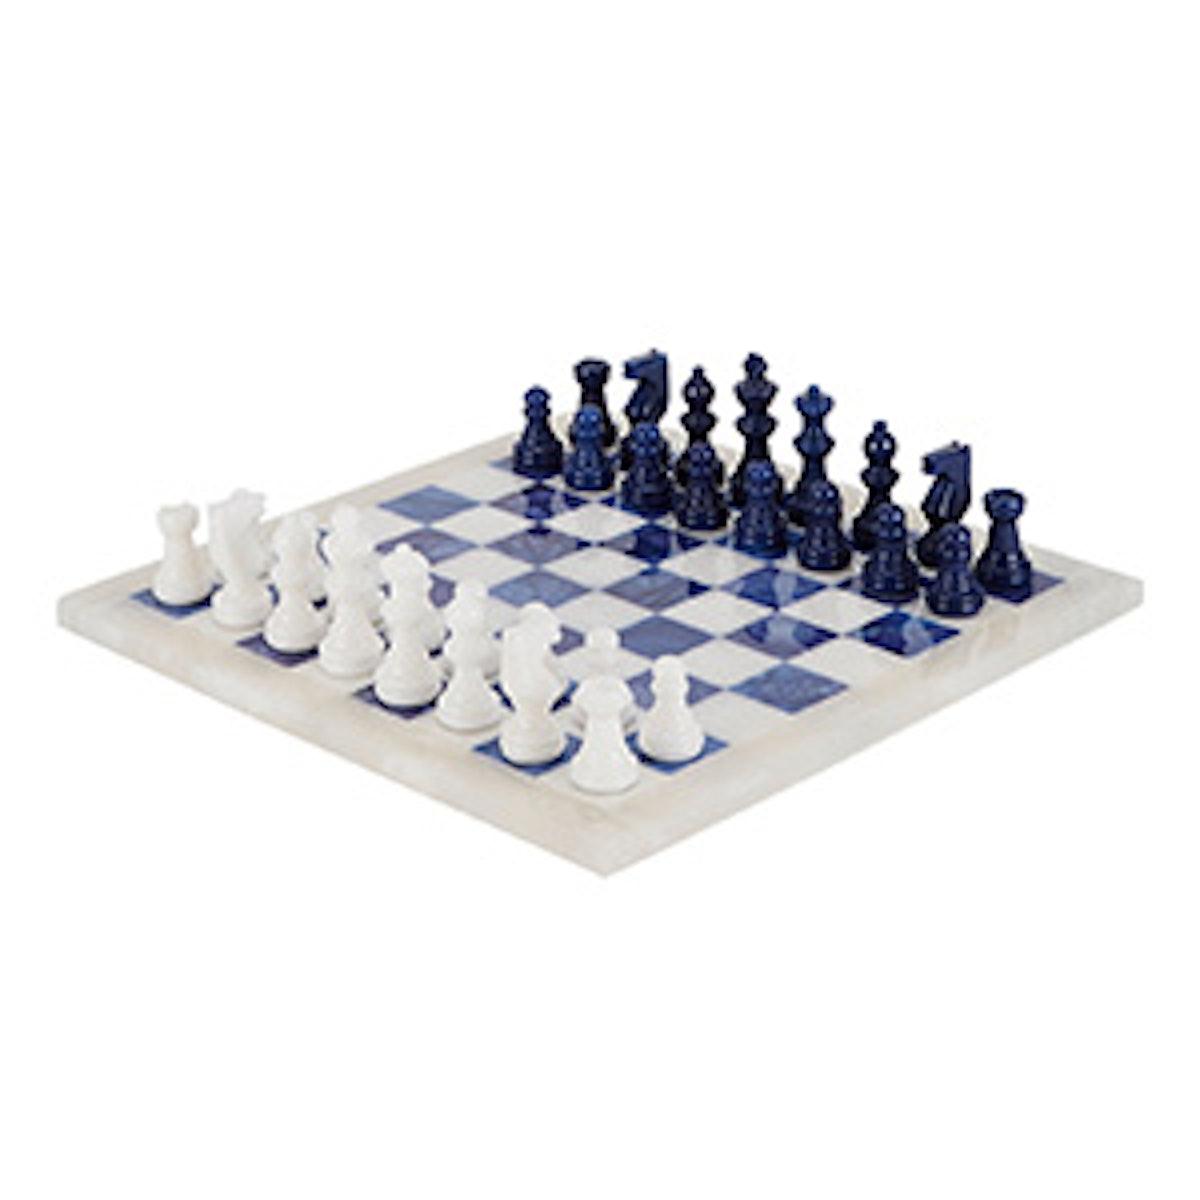 Marbled Alabaster Chess Set